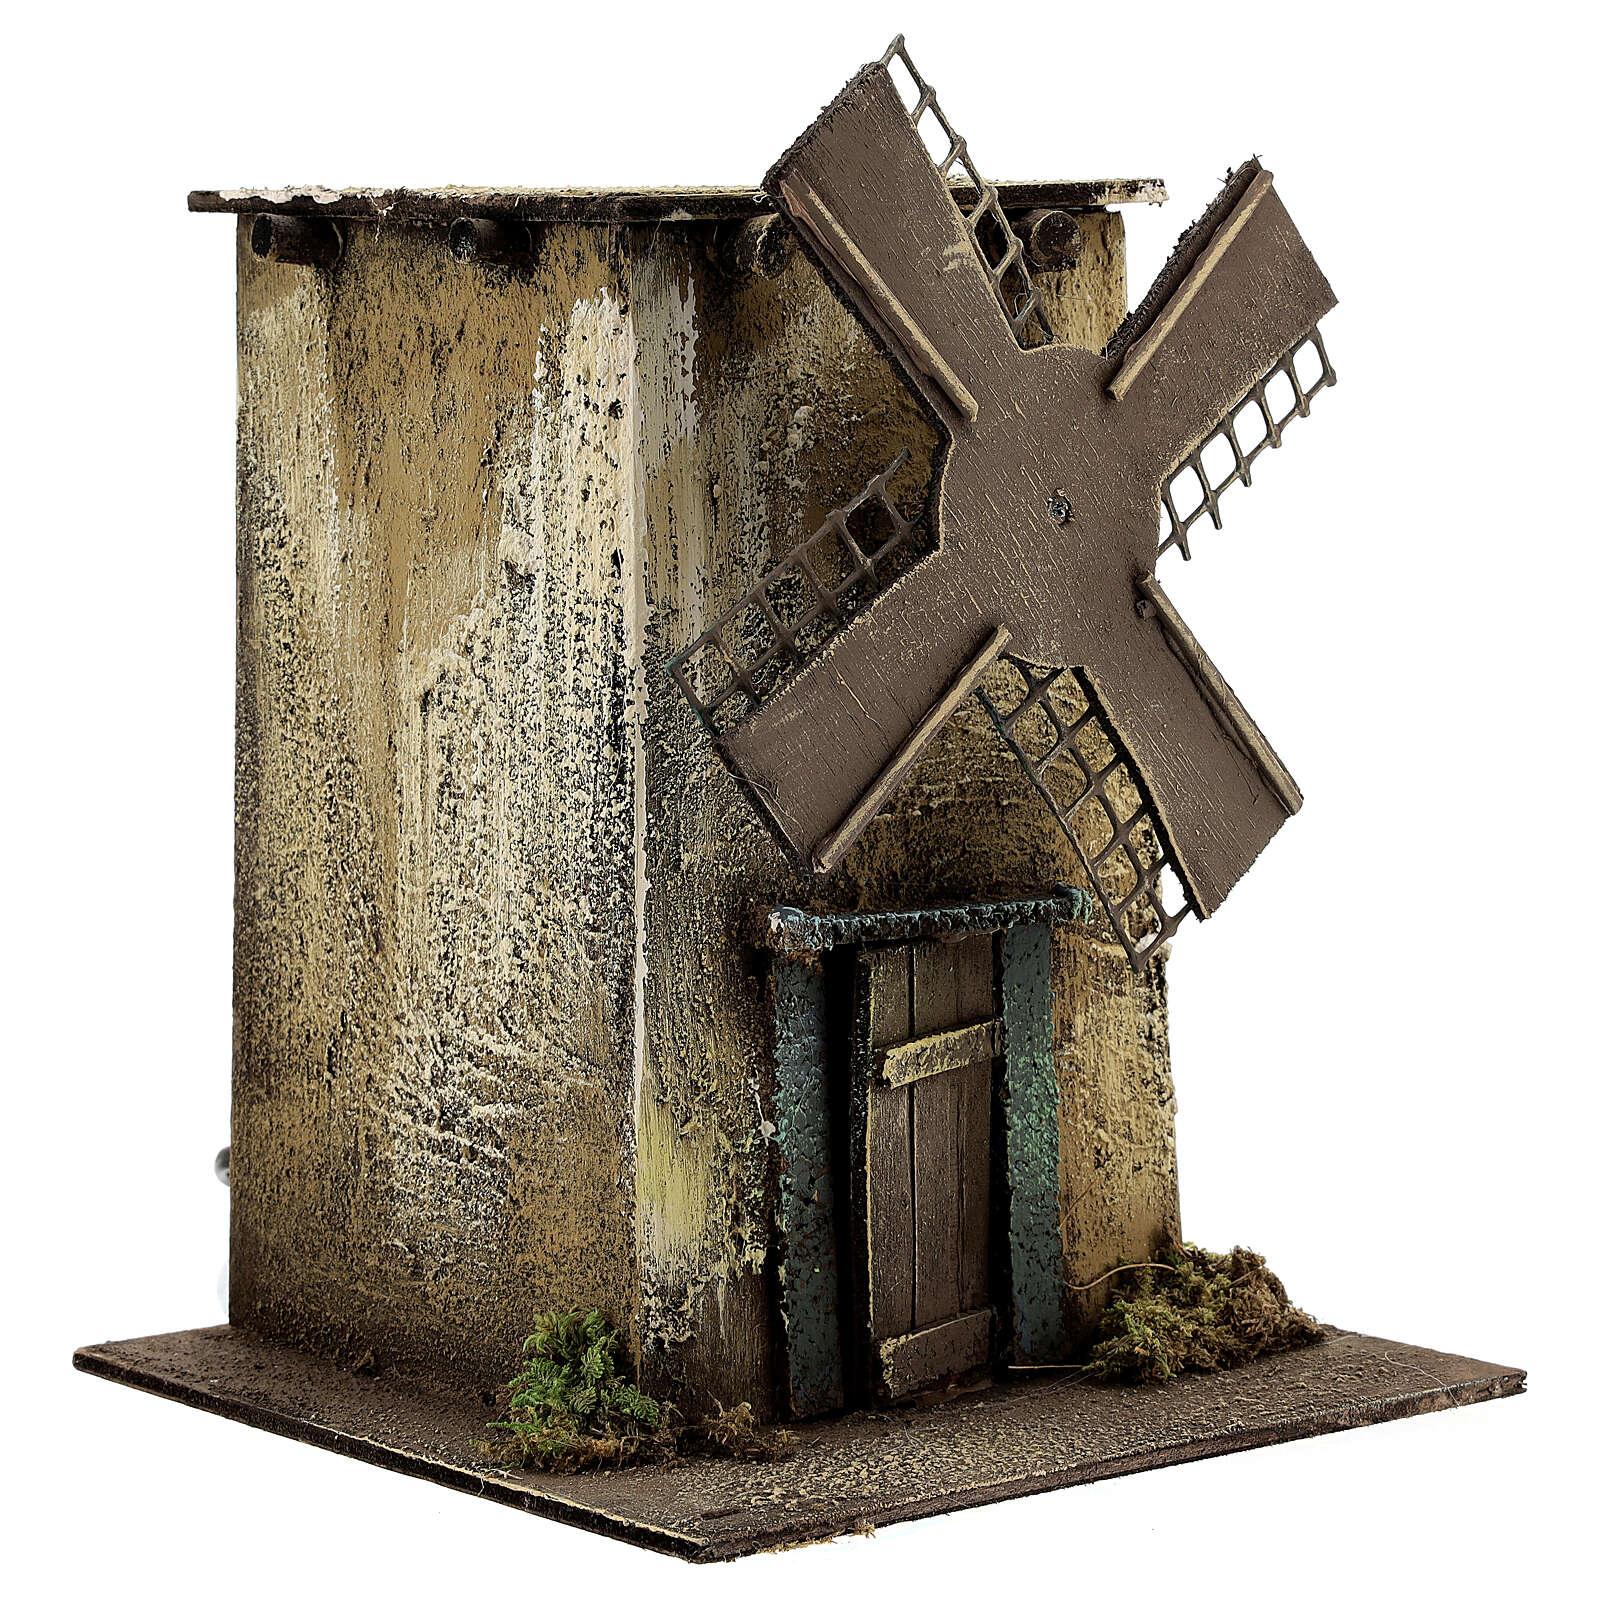 Neapolitan Nativity scene, moving windmill 25x15x25 cm 4